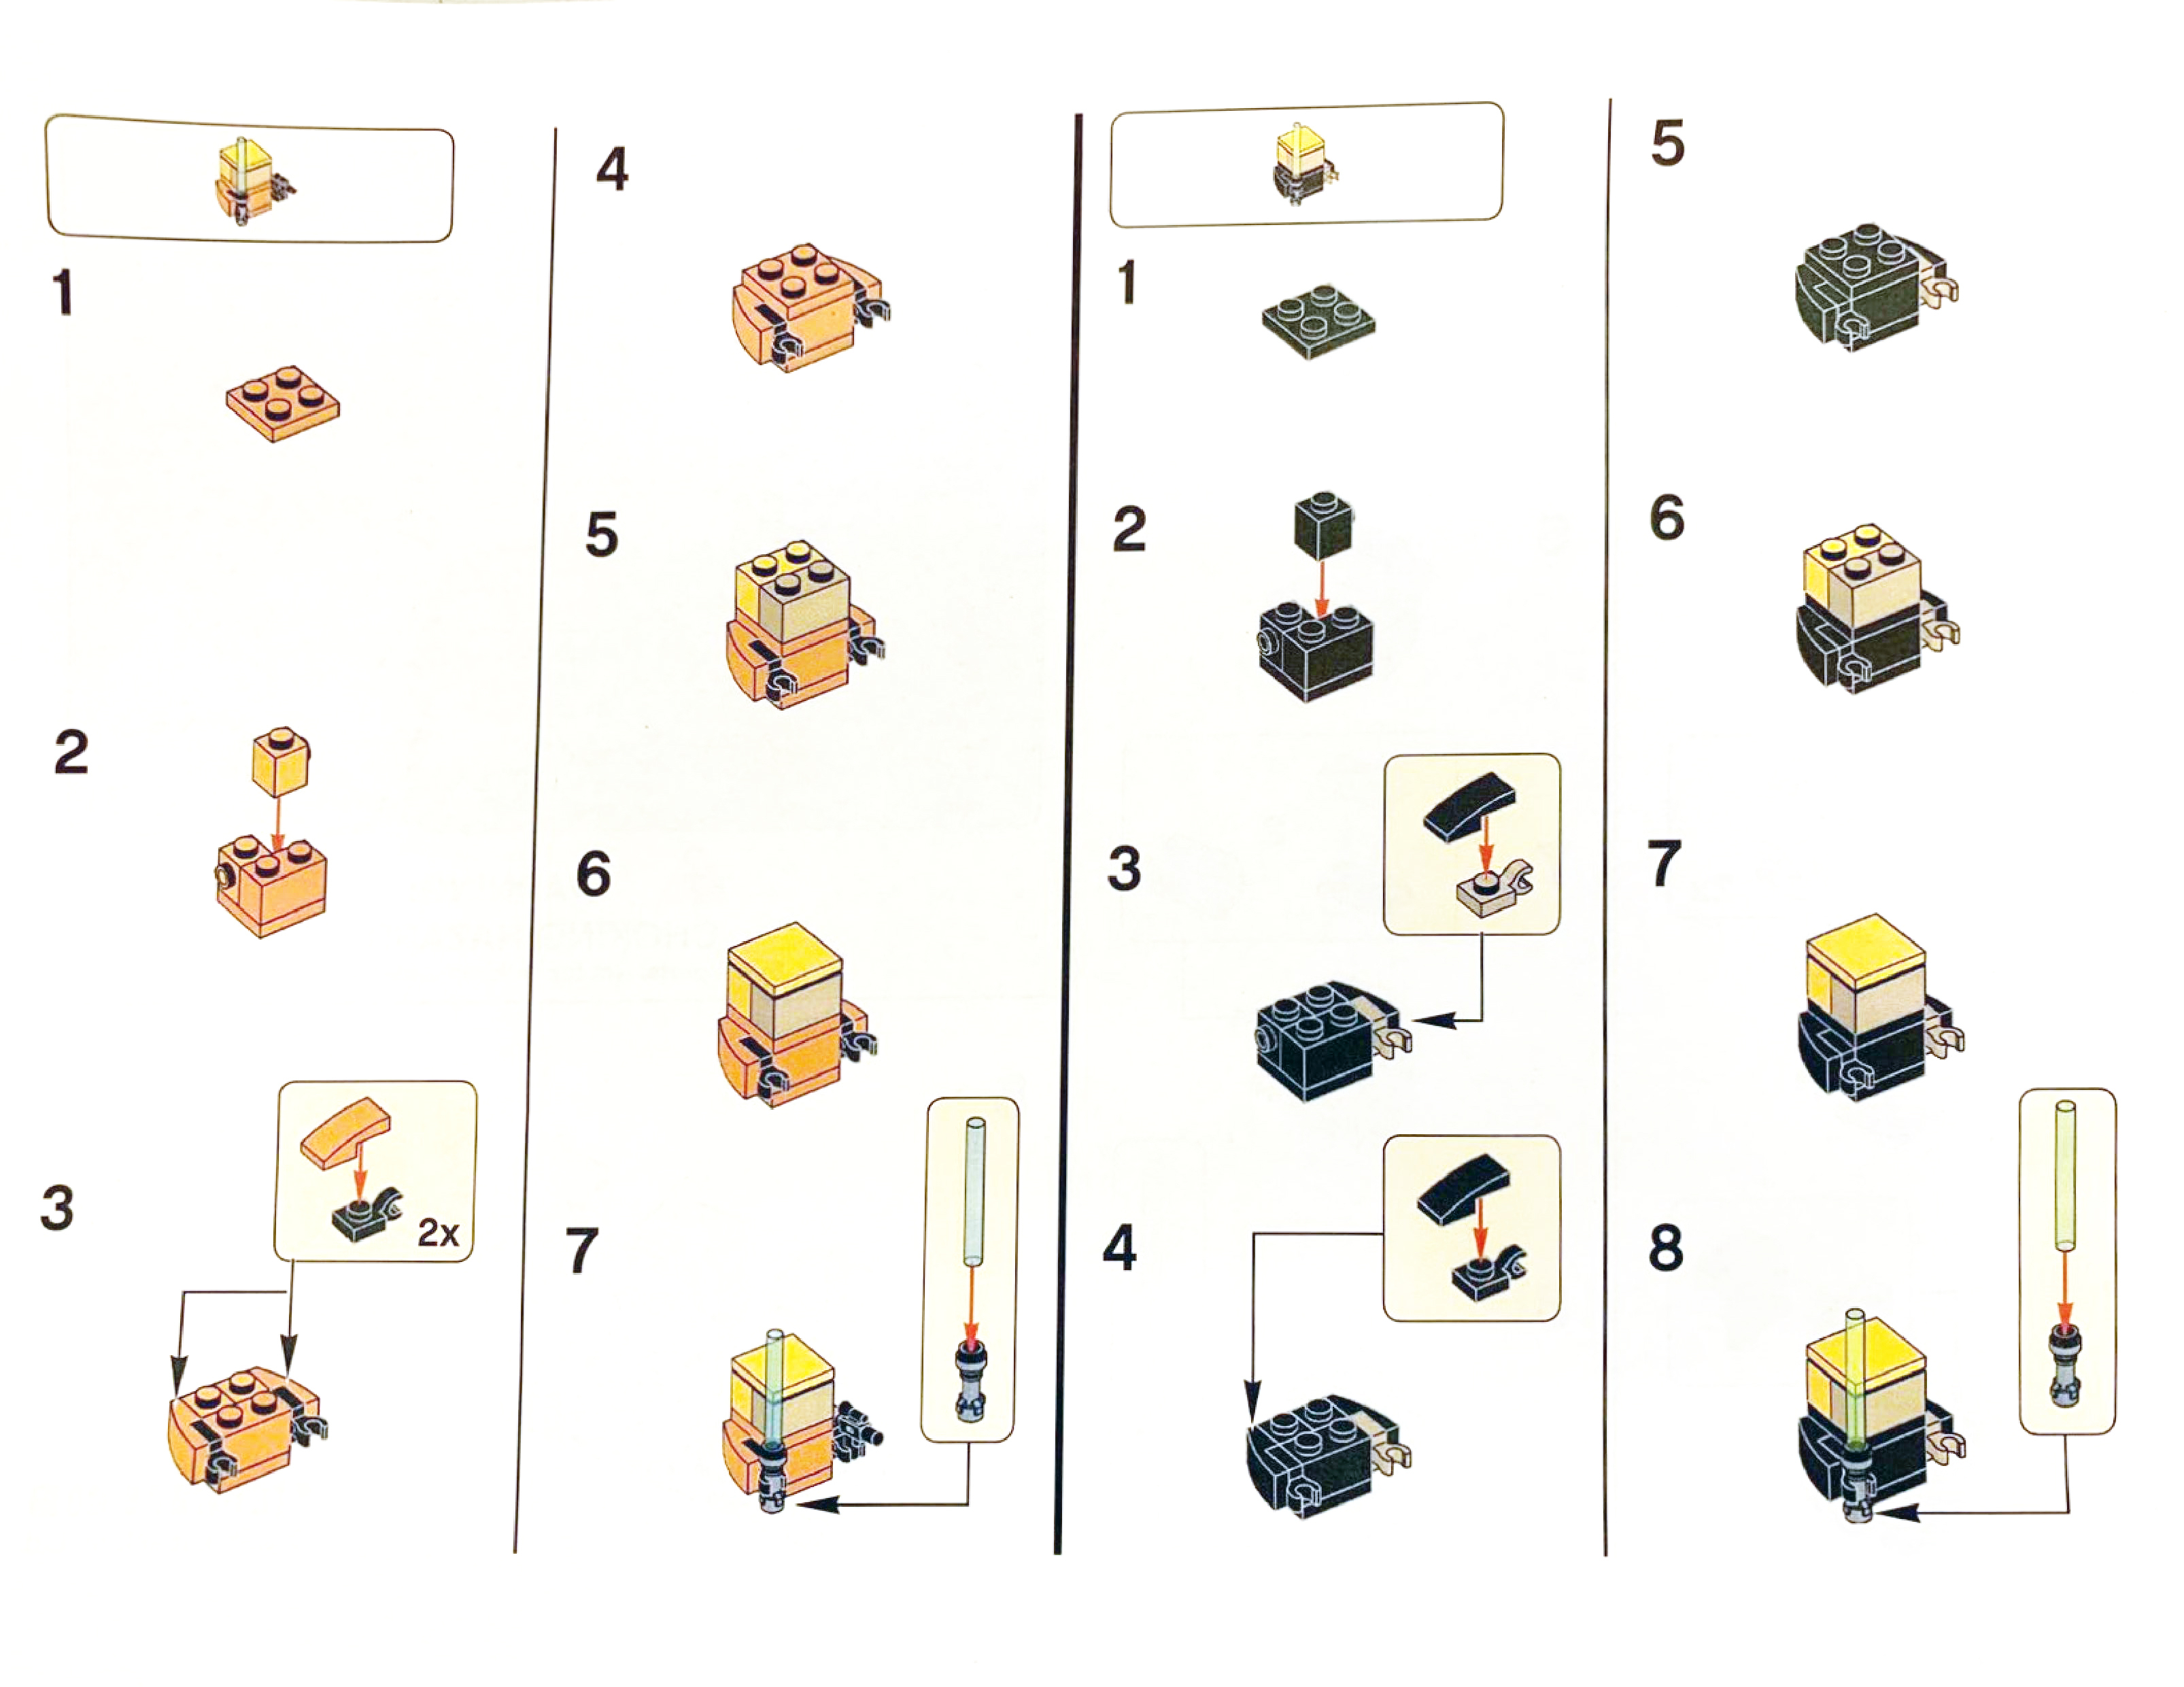 Lego Star Wars Luke Skywalker Timeline Building Instructions in Lego Star Wars Advent Calendar 2011 Instructions